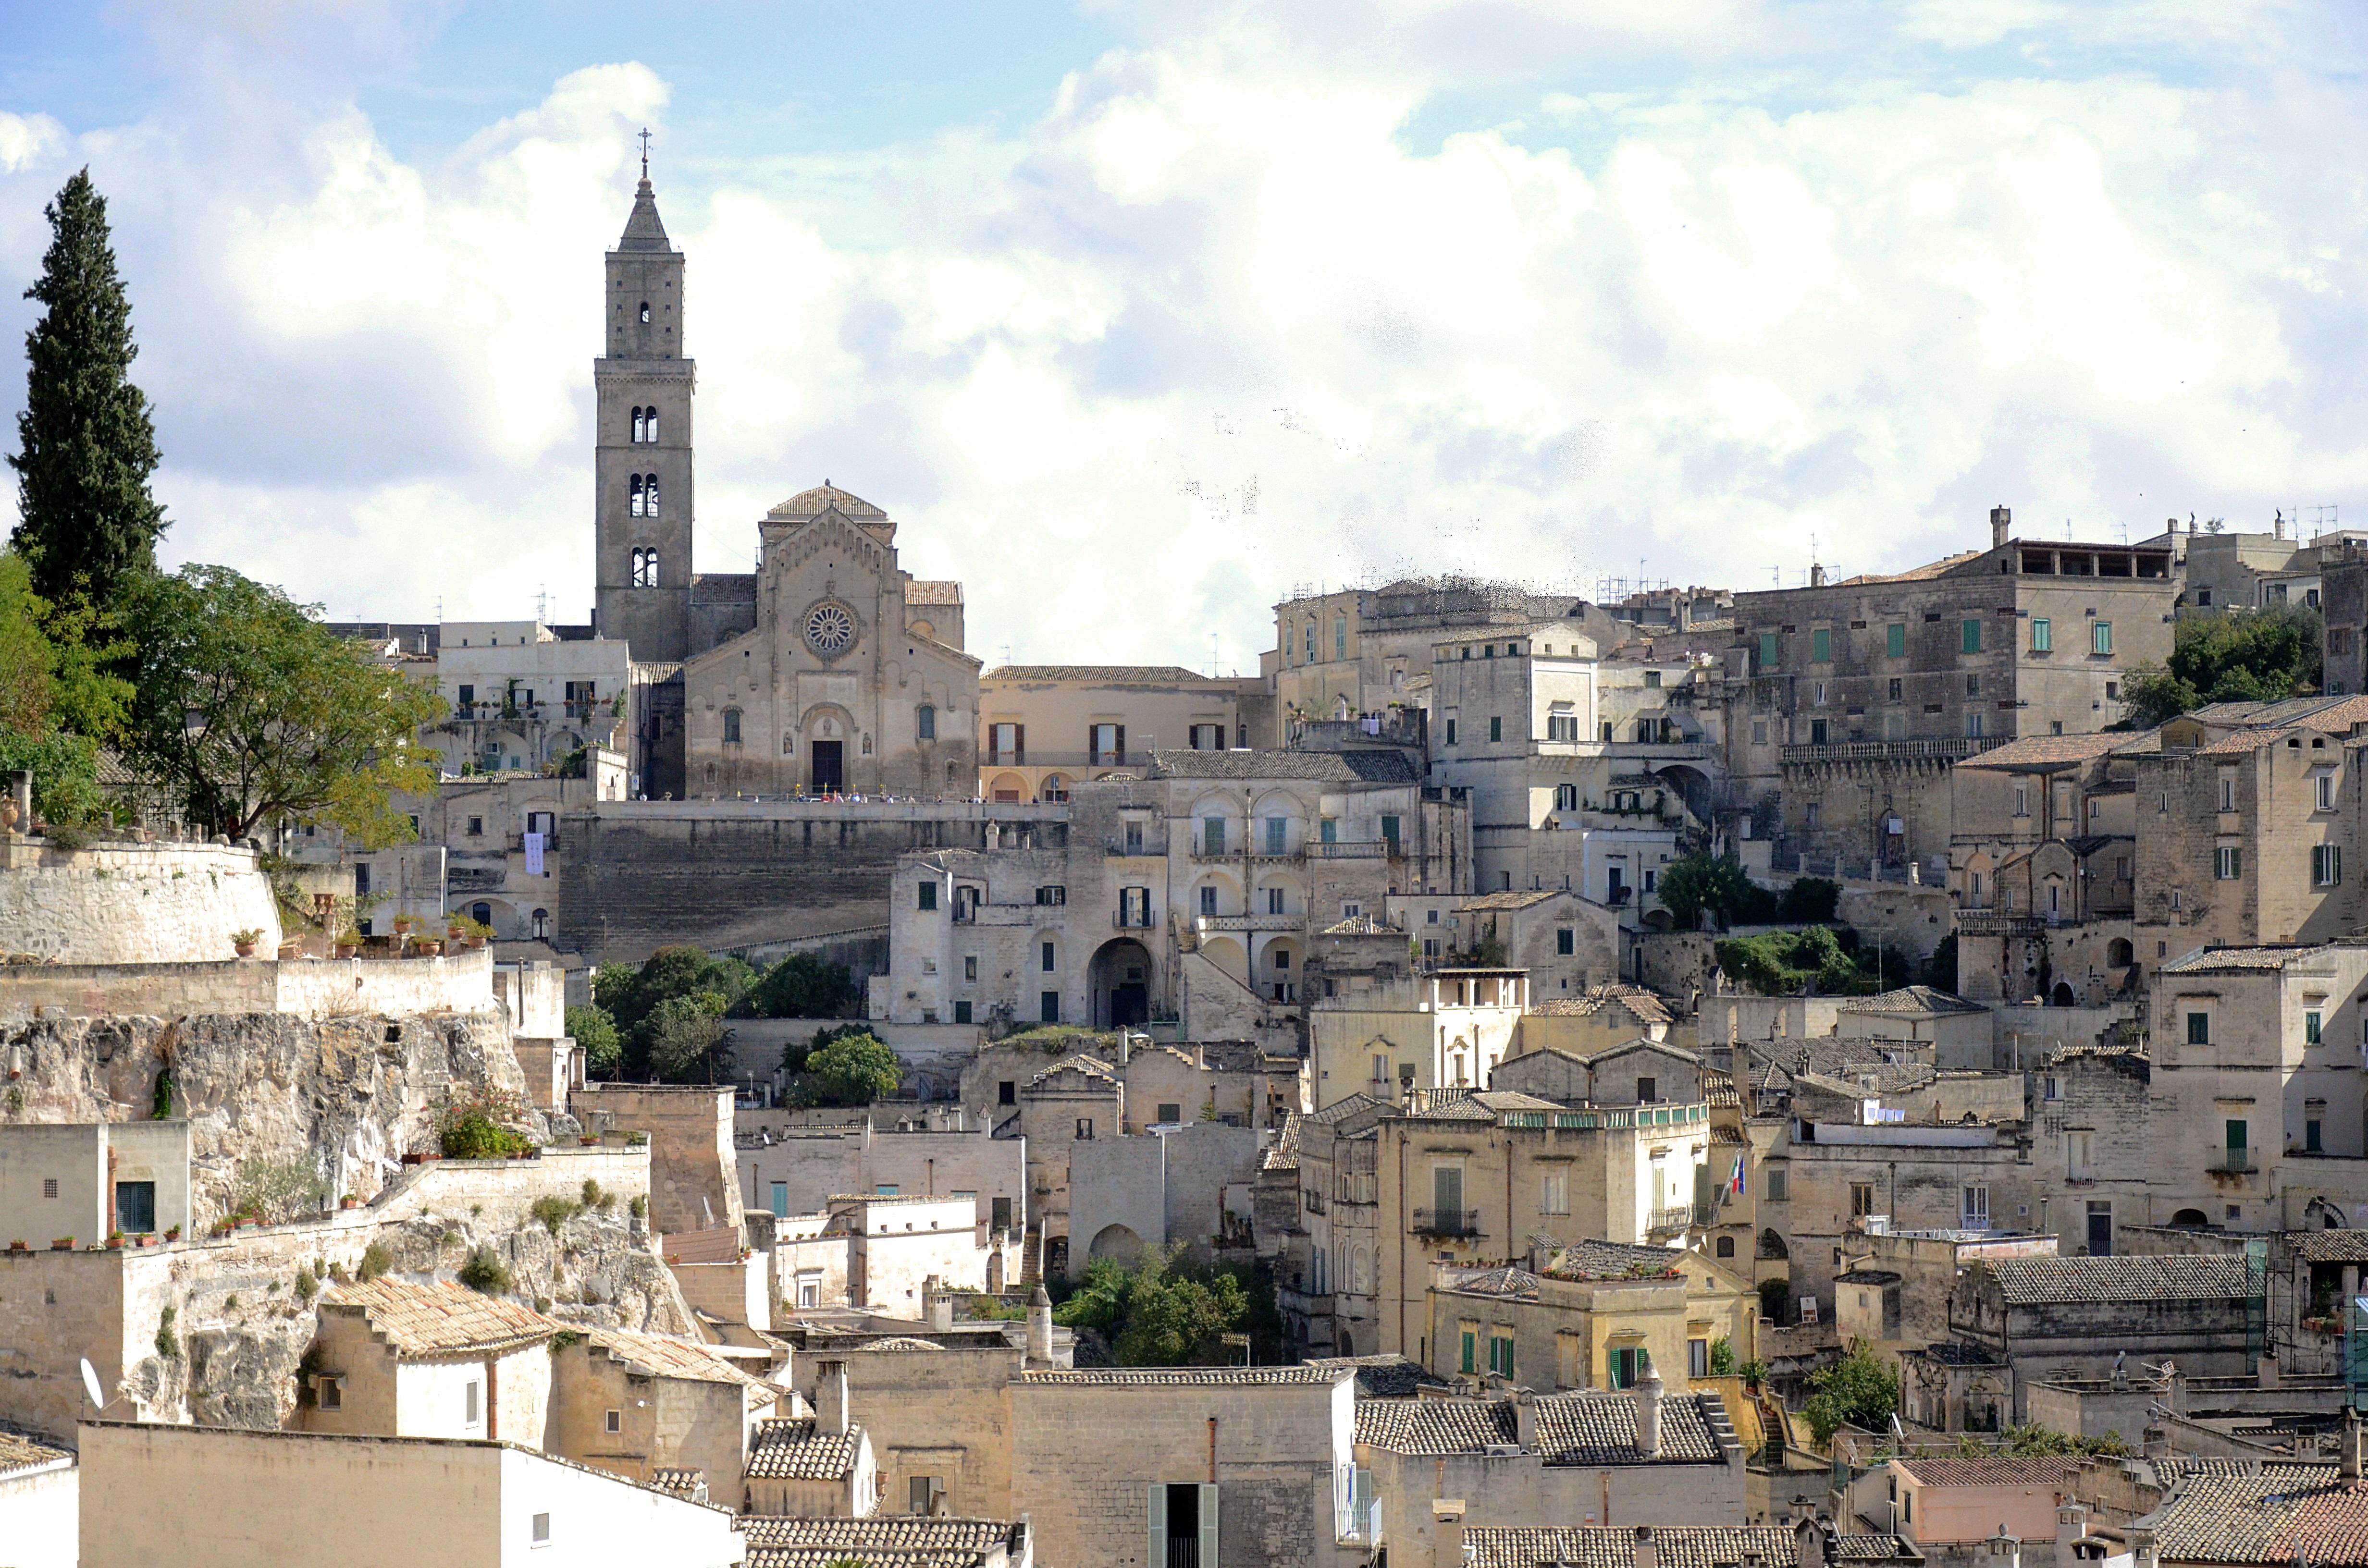 Kartinki Gorodskoj Pejzazh Orientir Italiya Ruiny Matera